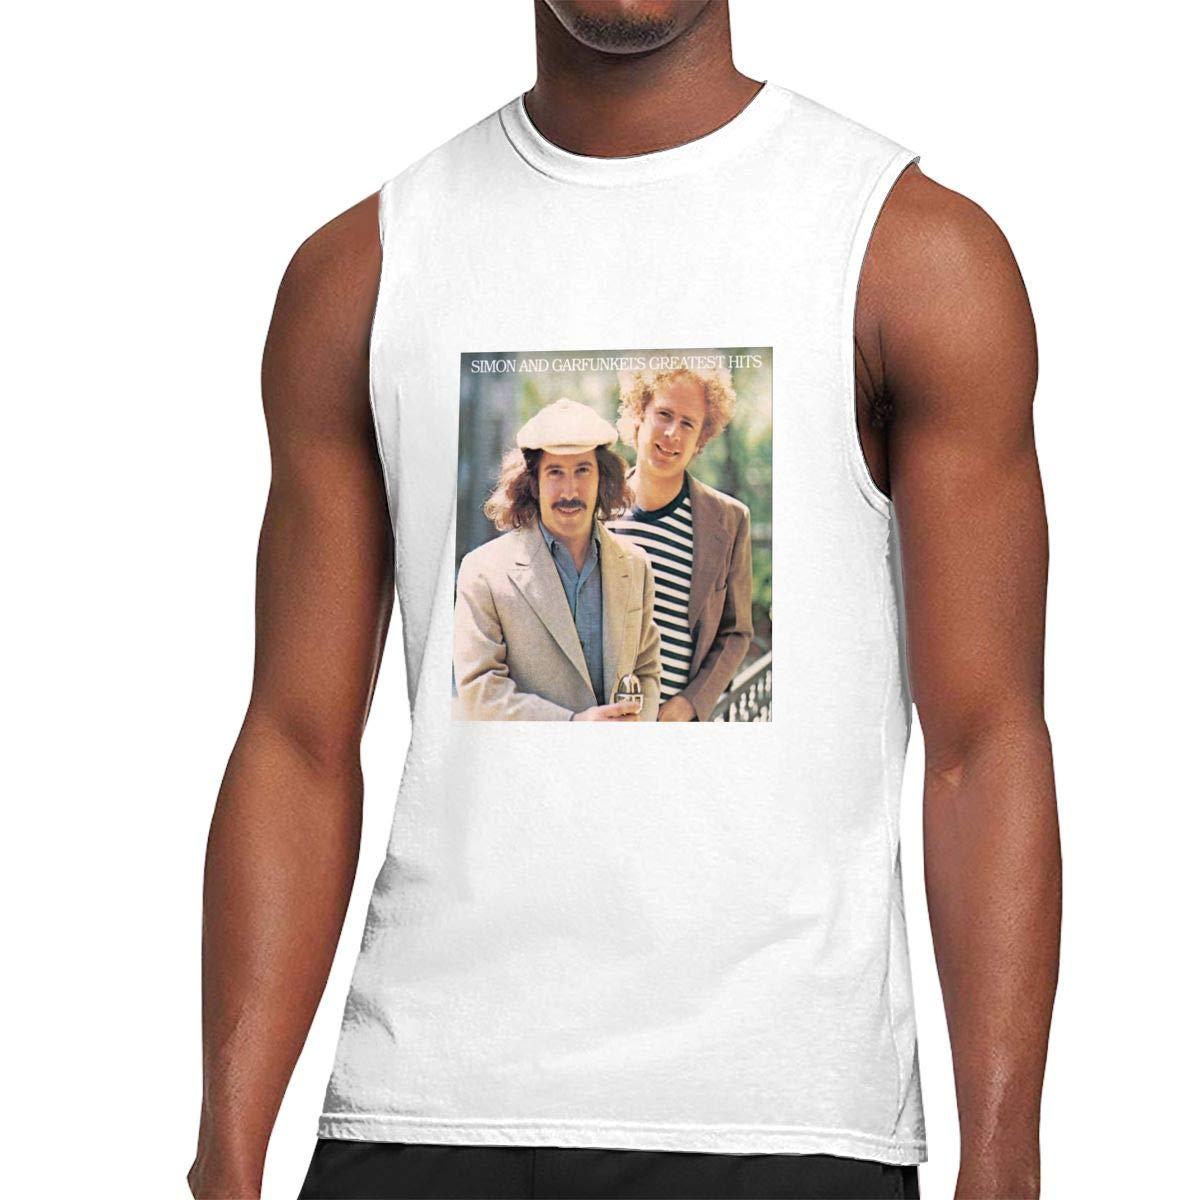 Seuriamin Simon Garfunkel Greatest Hits Fashion Walk Sleeveless Muscle Short Sleeve Ts Shi